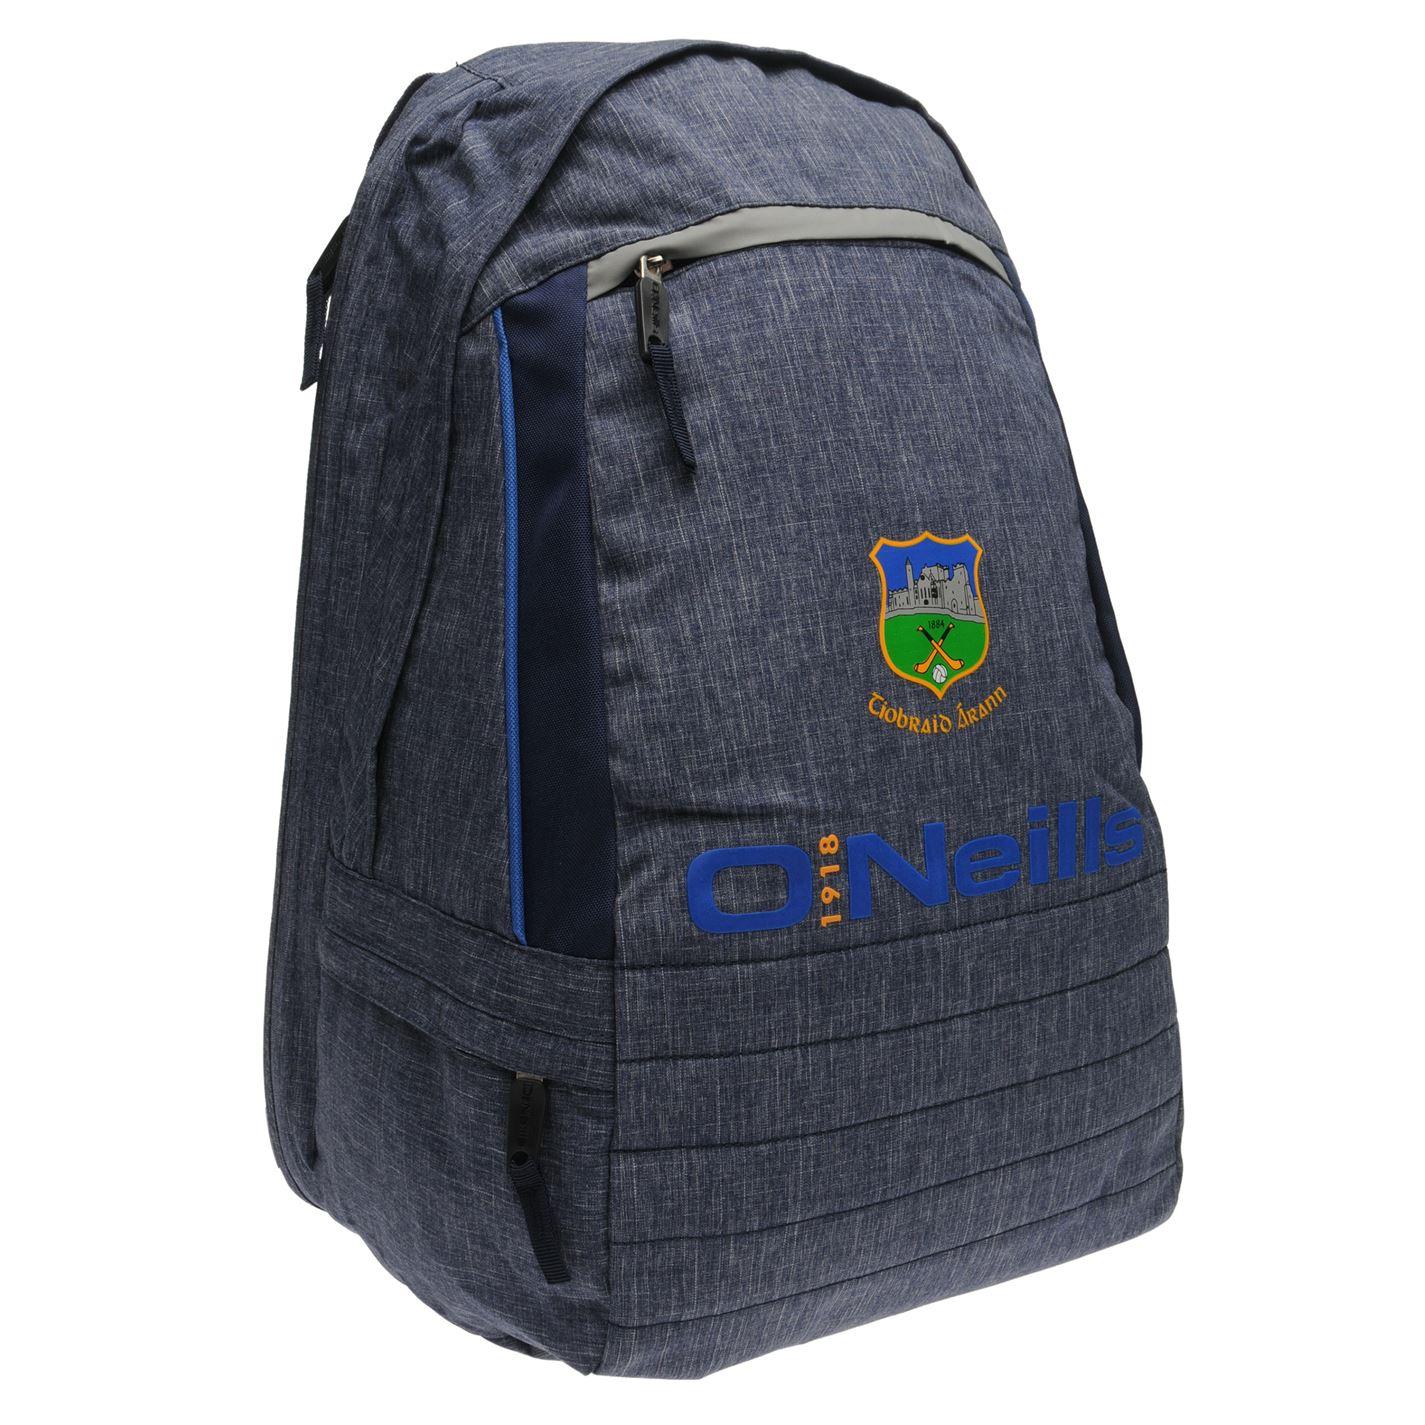 ONeills Tipperary GAA Falcon Backpack